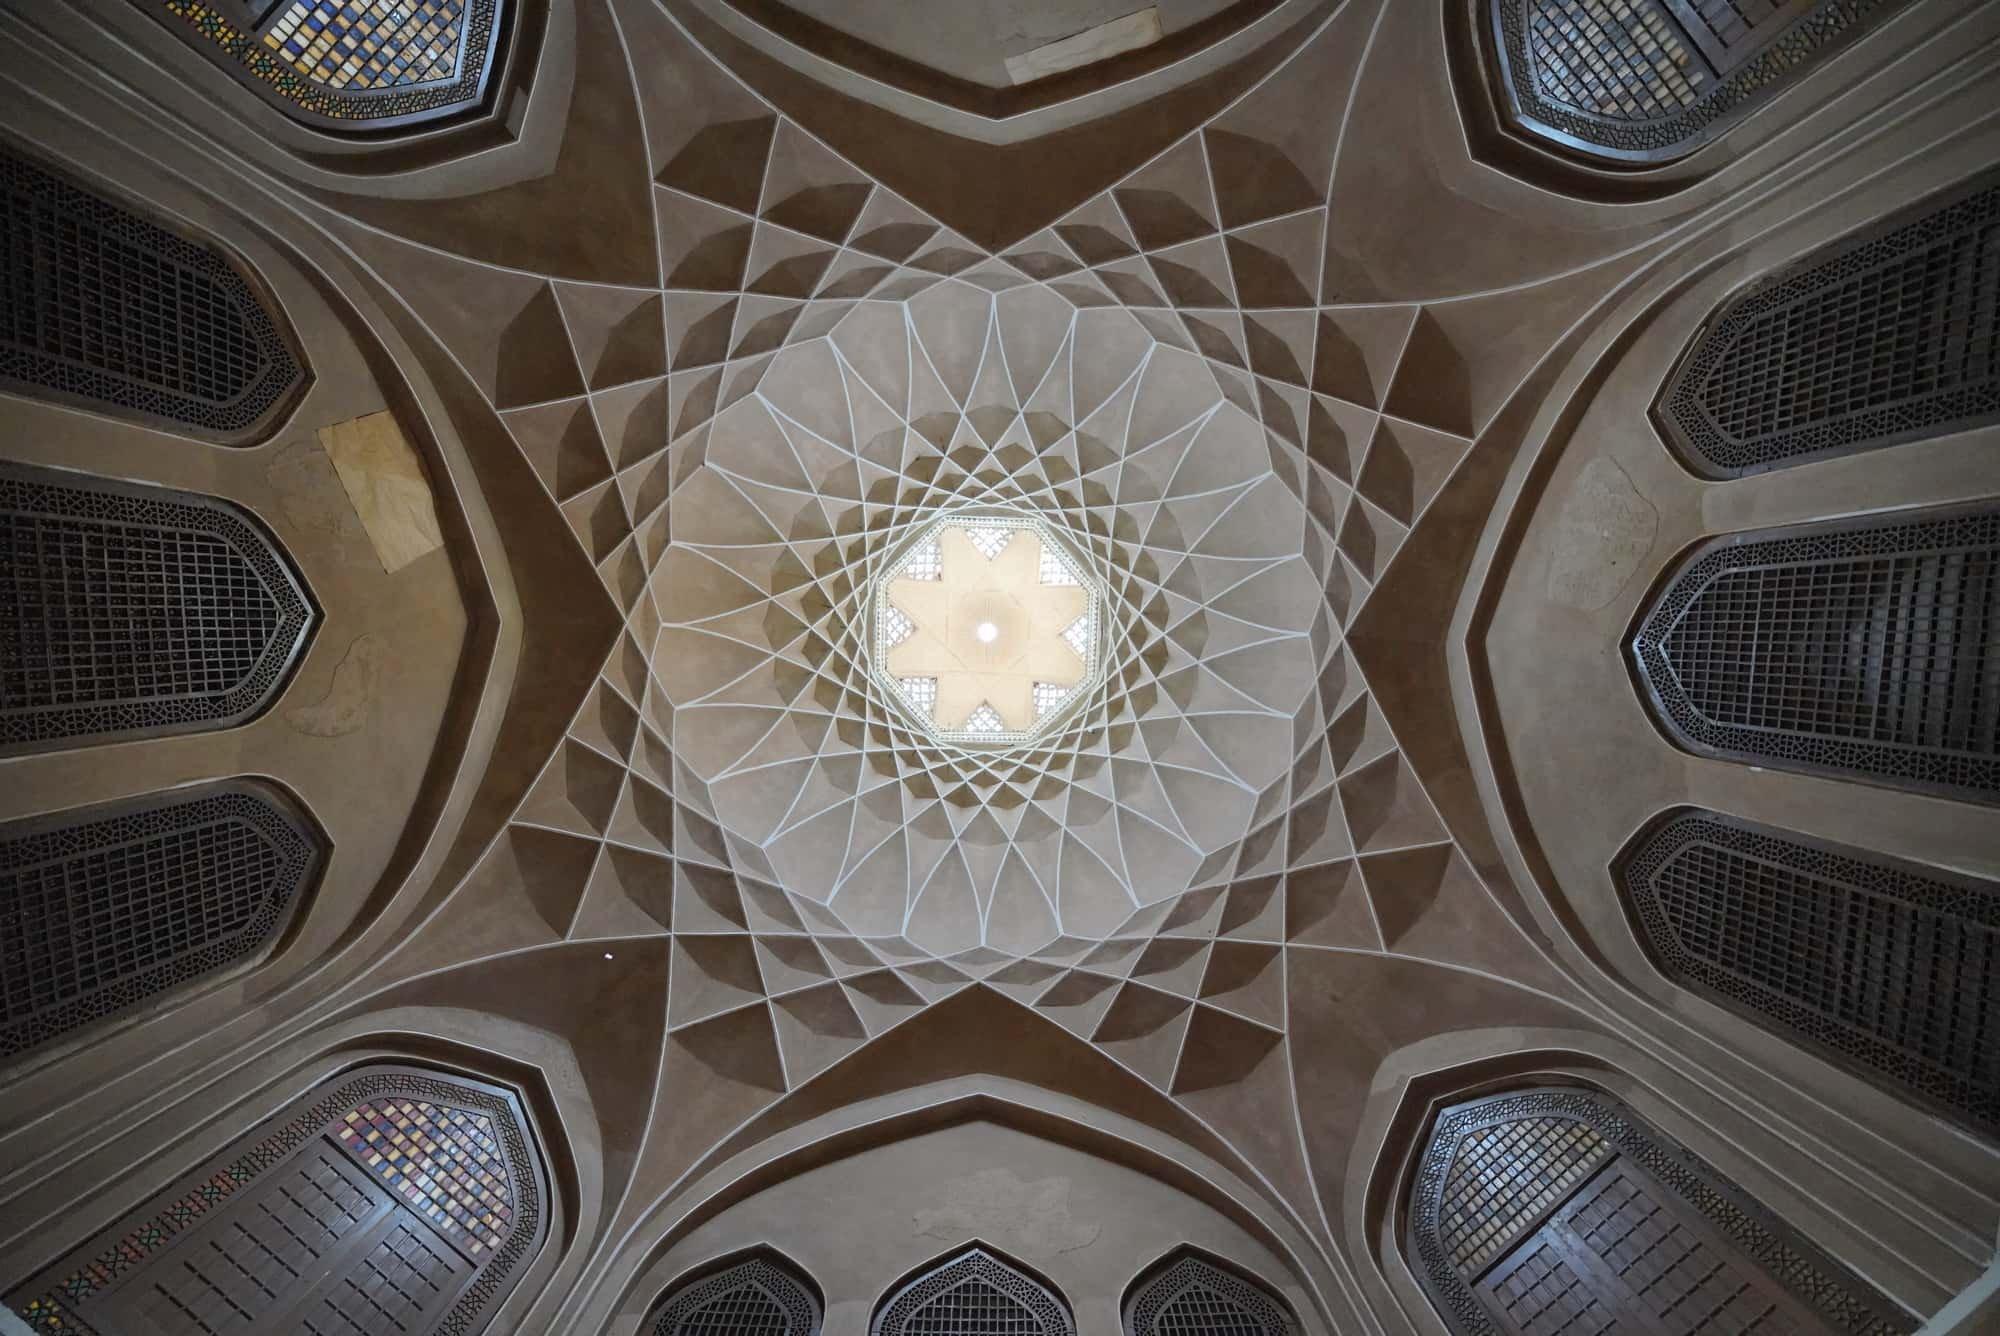 Wim Velema Iran 2019-12.jpg